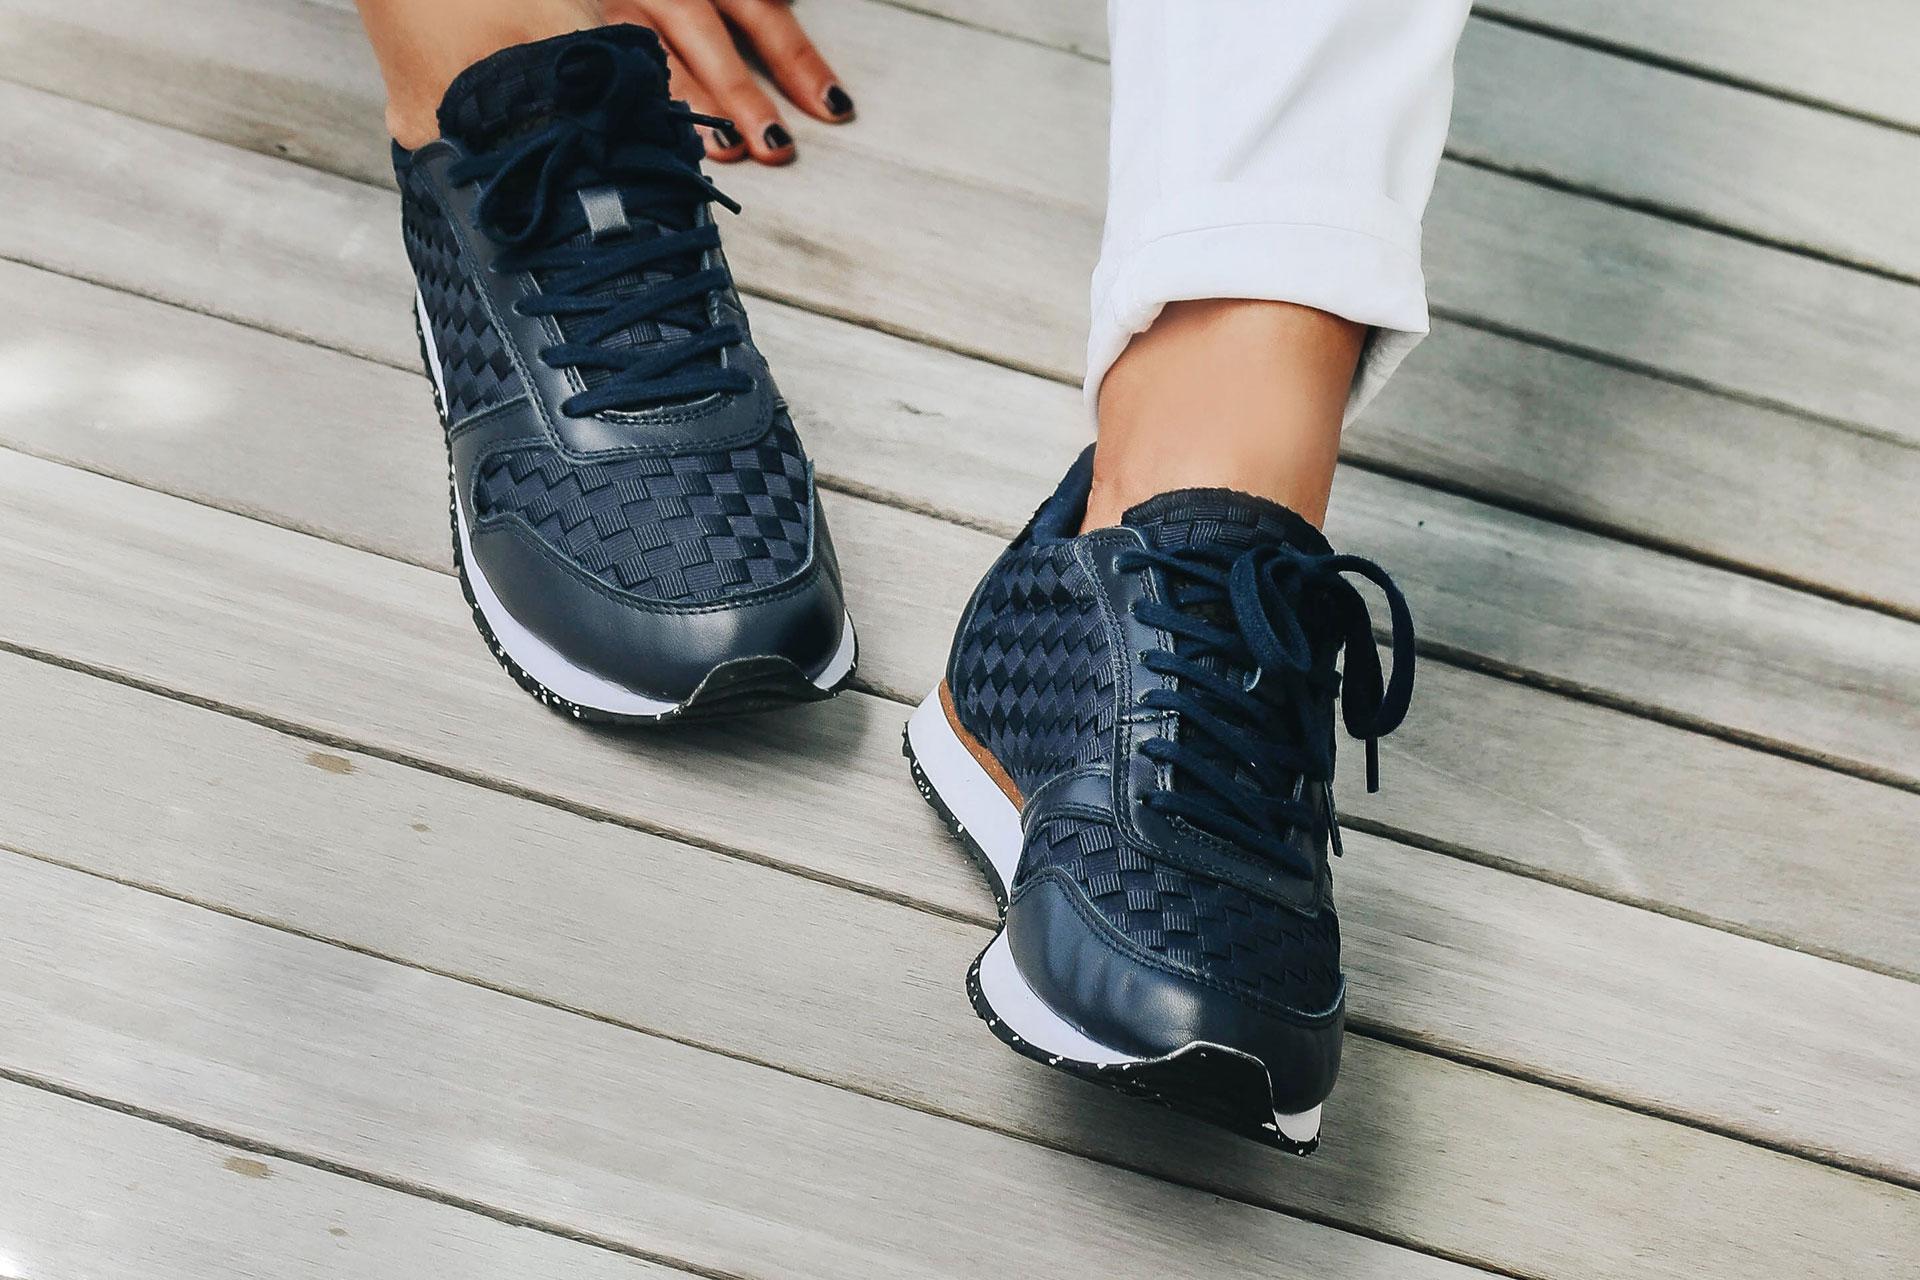 WODEN_sneakers-minimalistic-sustainability-Ydun_NSC-Navy